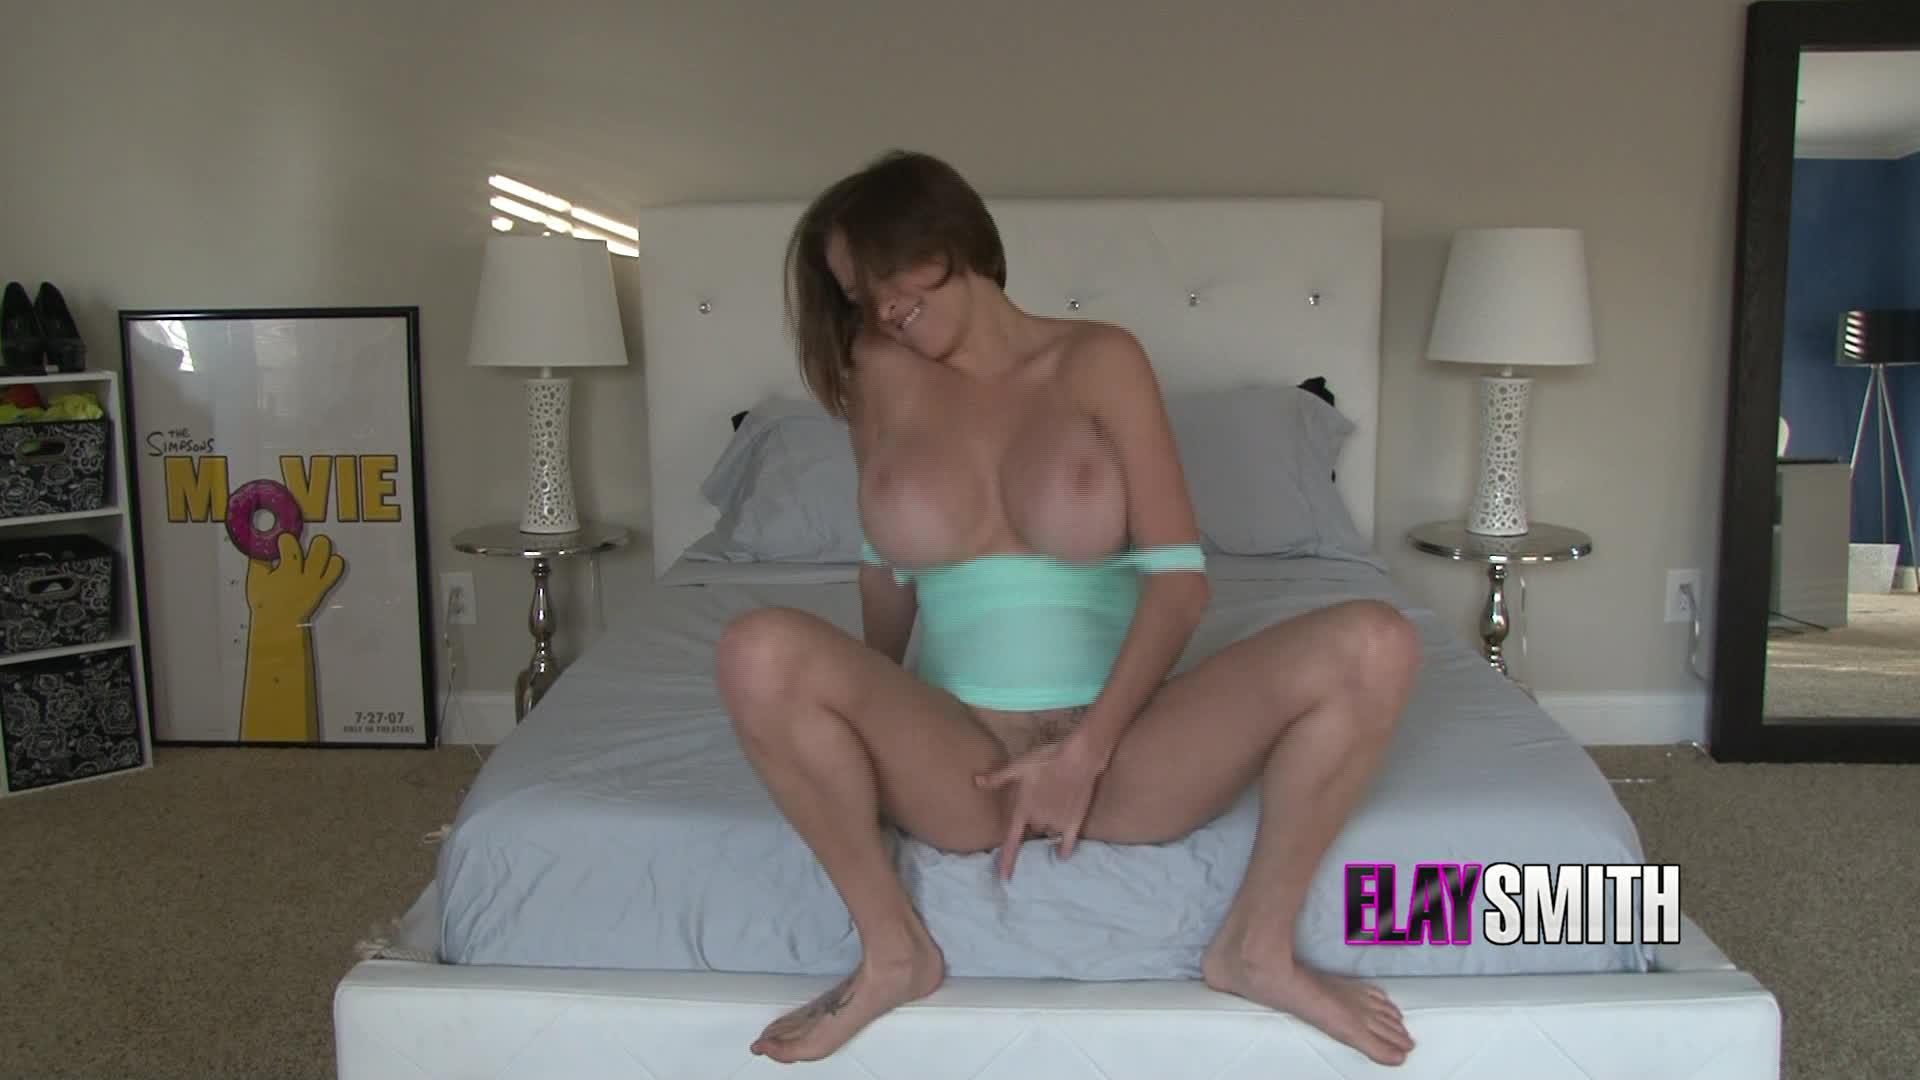 """Elay Smith"" (Squirting, Short Hair, Big Tits, Solo Female, Solo masturbation) Slapping Wet - ManyVids Production"